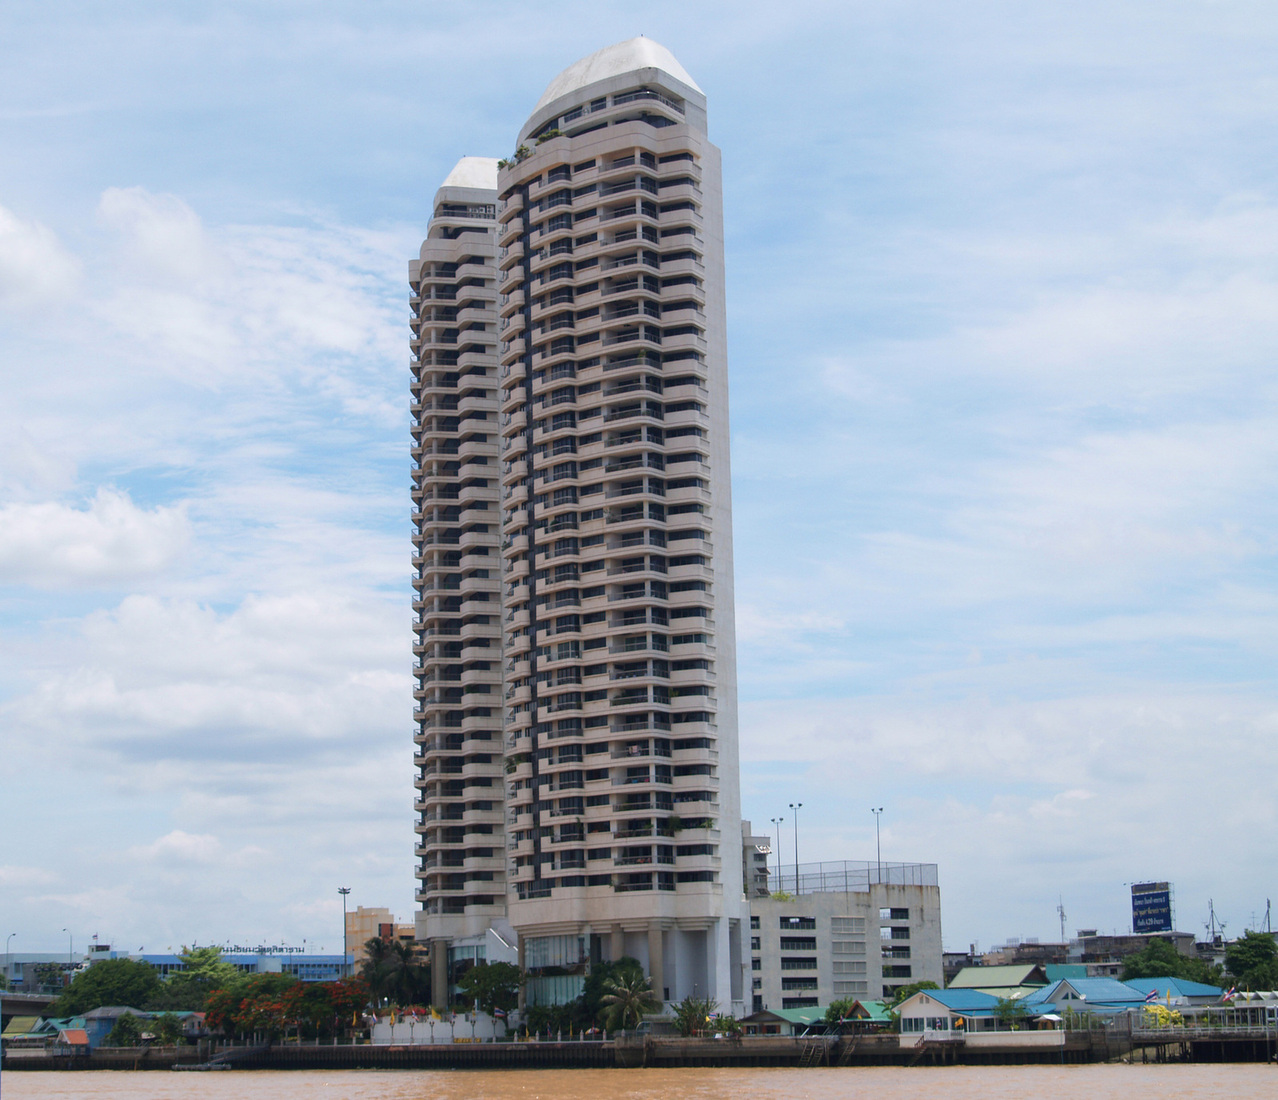 thailand-bangkok-building-1228301-1278x1099